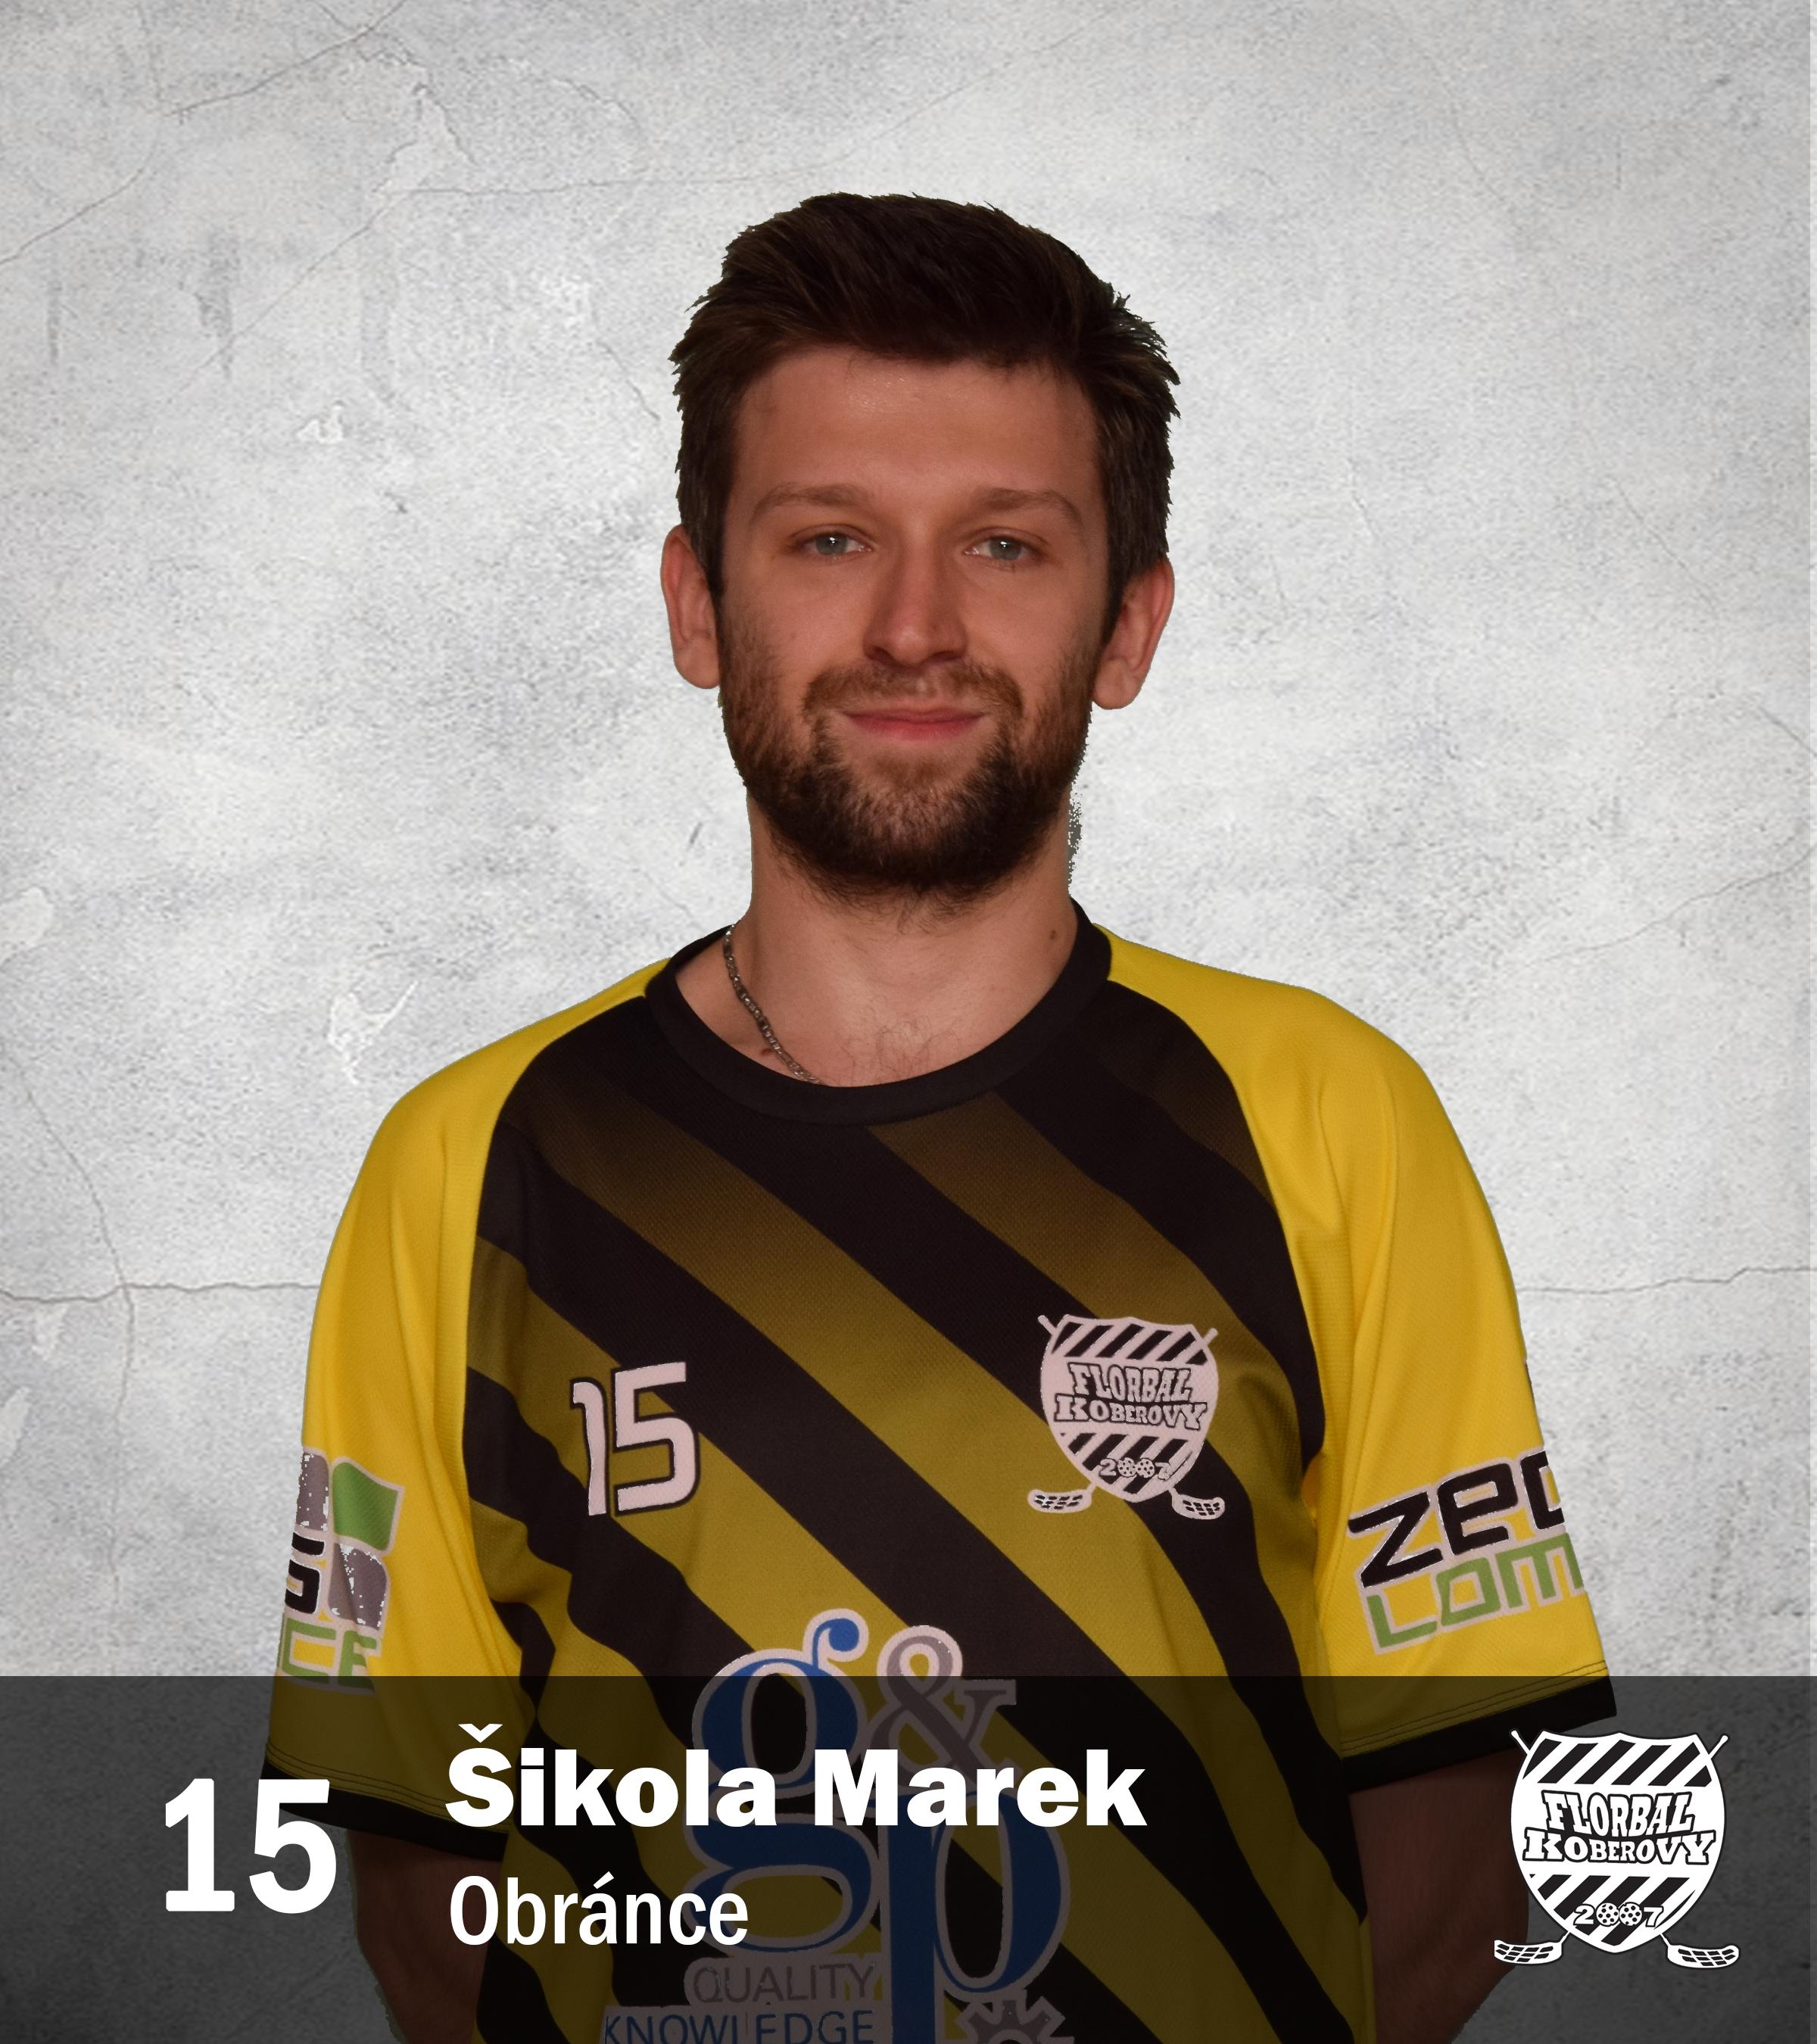 15 Šikola Marek